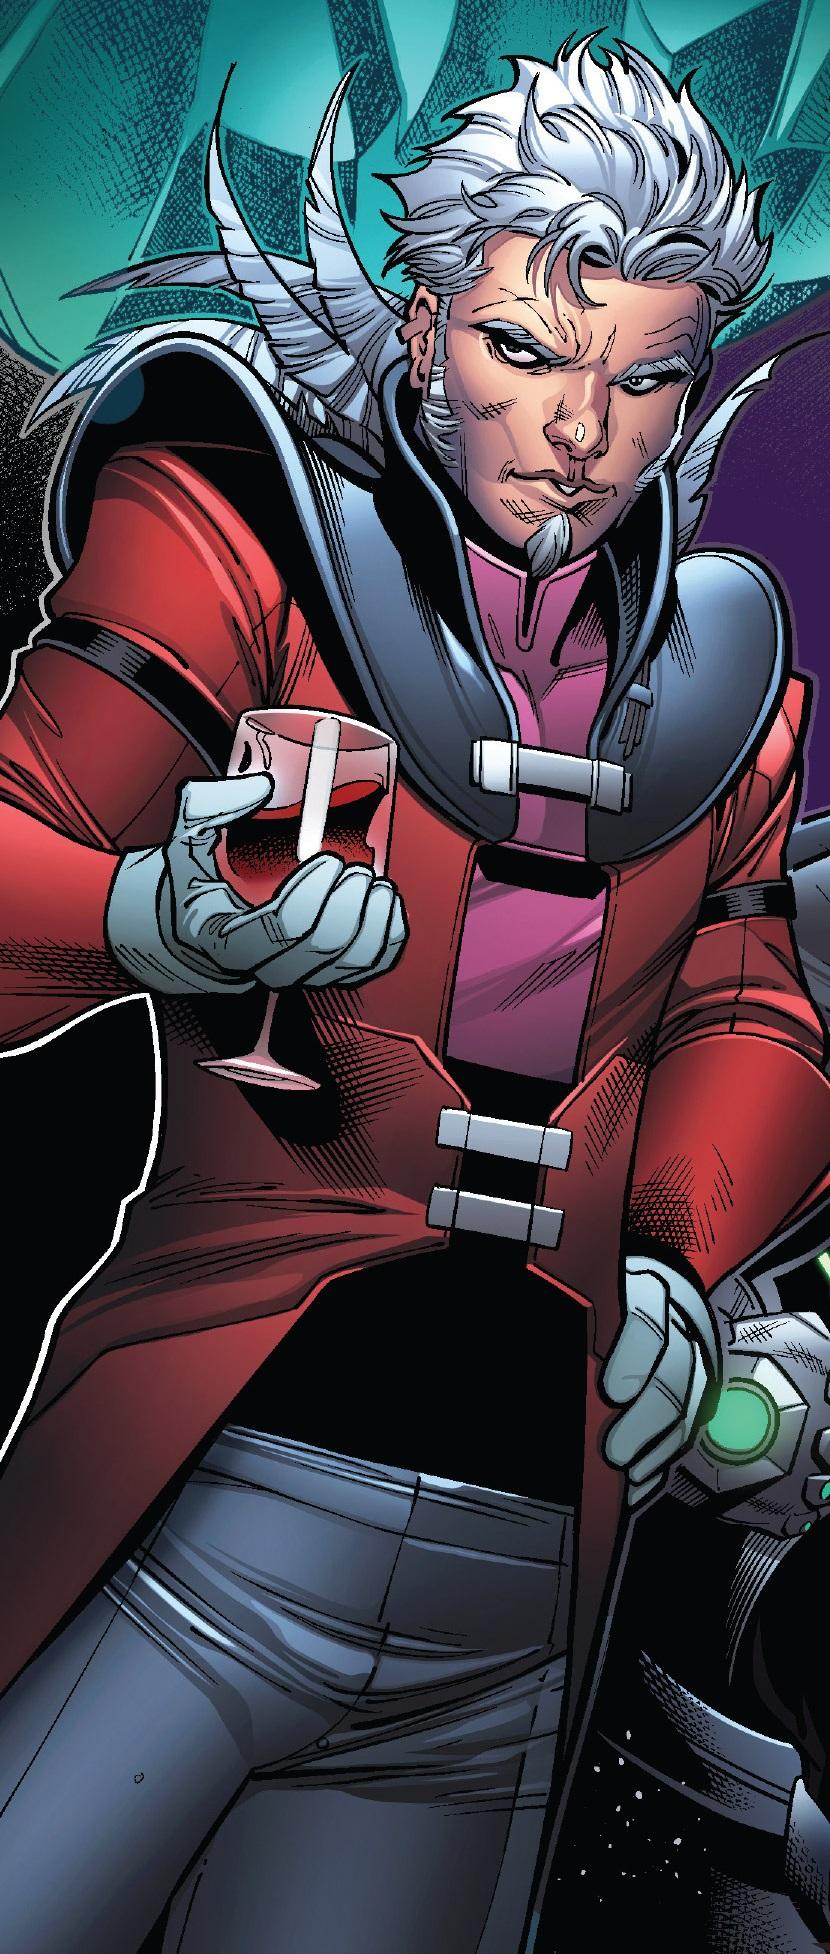 Taneleer Tivan (Earth-616)